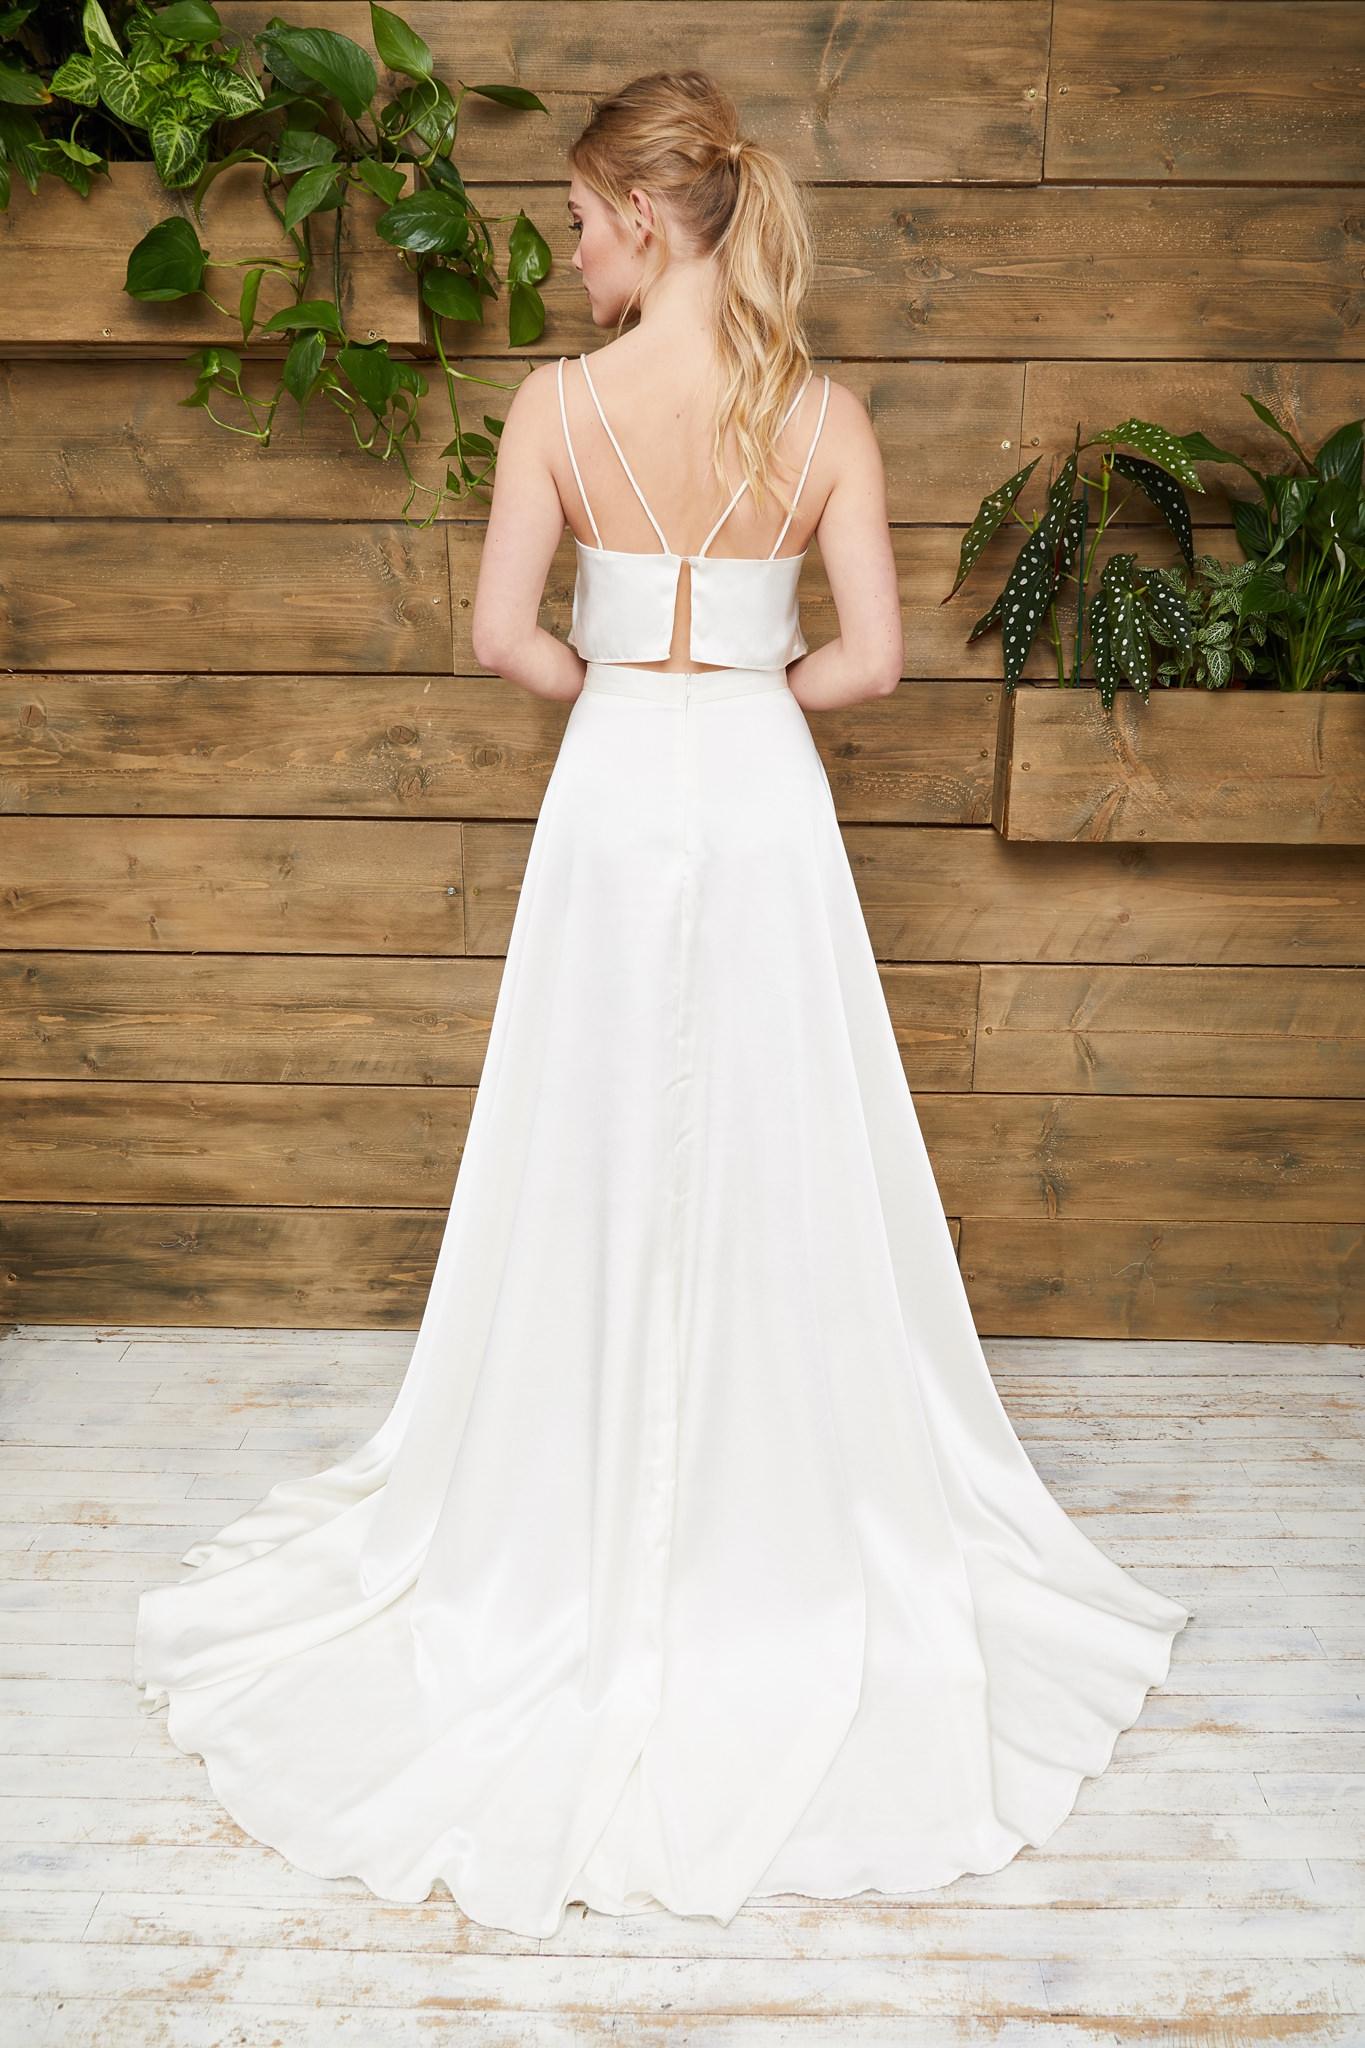 Rachel Burgess Bridal Boutique - Bridal Separates - Handmade Wedding, Boho wedding dress. Cleo&Olive Separates. E&W Couture.jpg